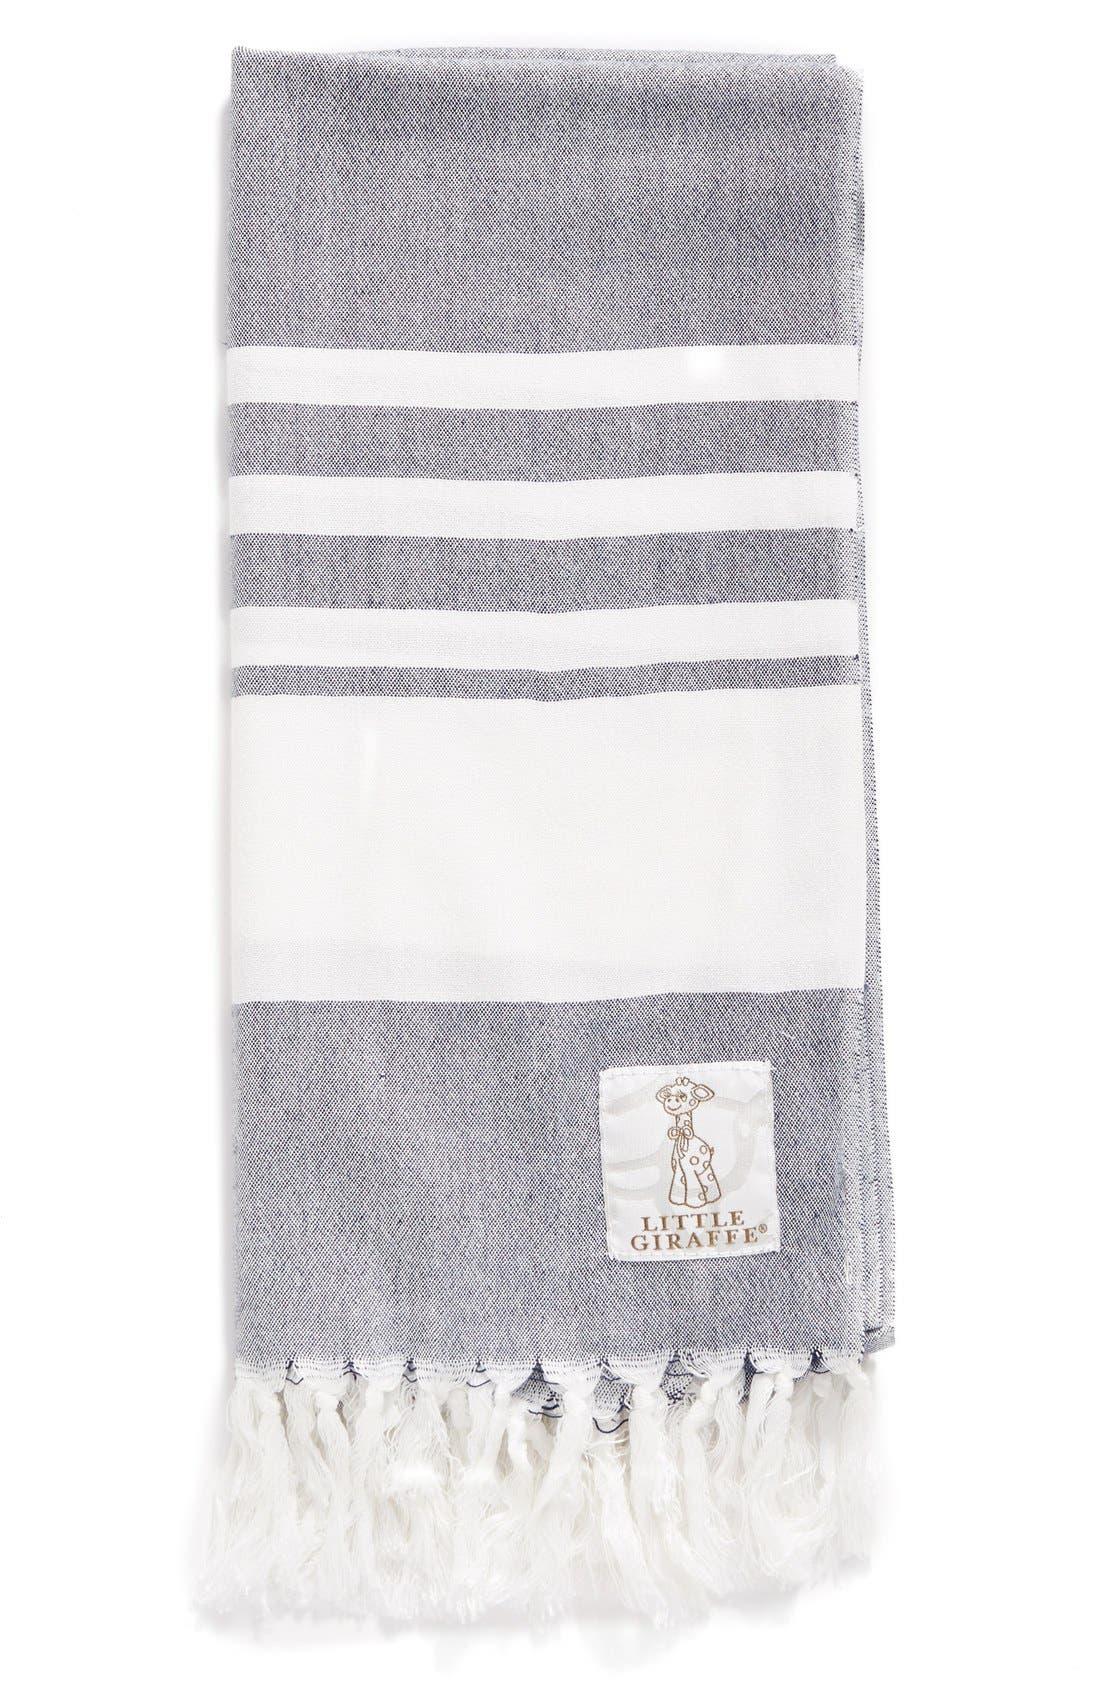 LITTLE GIRAFFE Indigo™ Turkish Towel